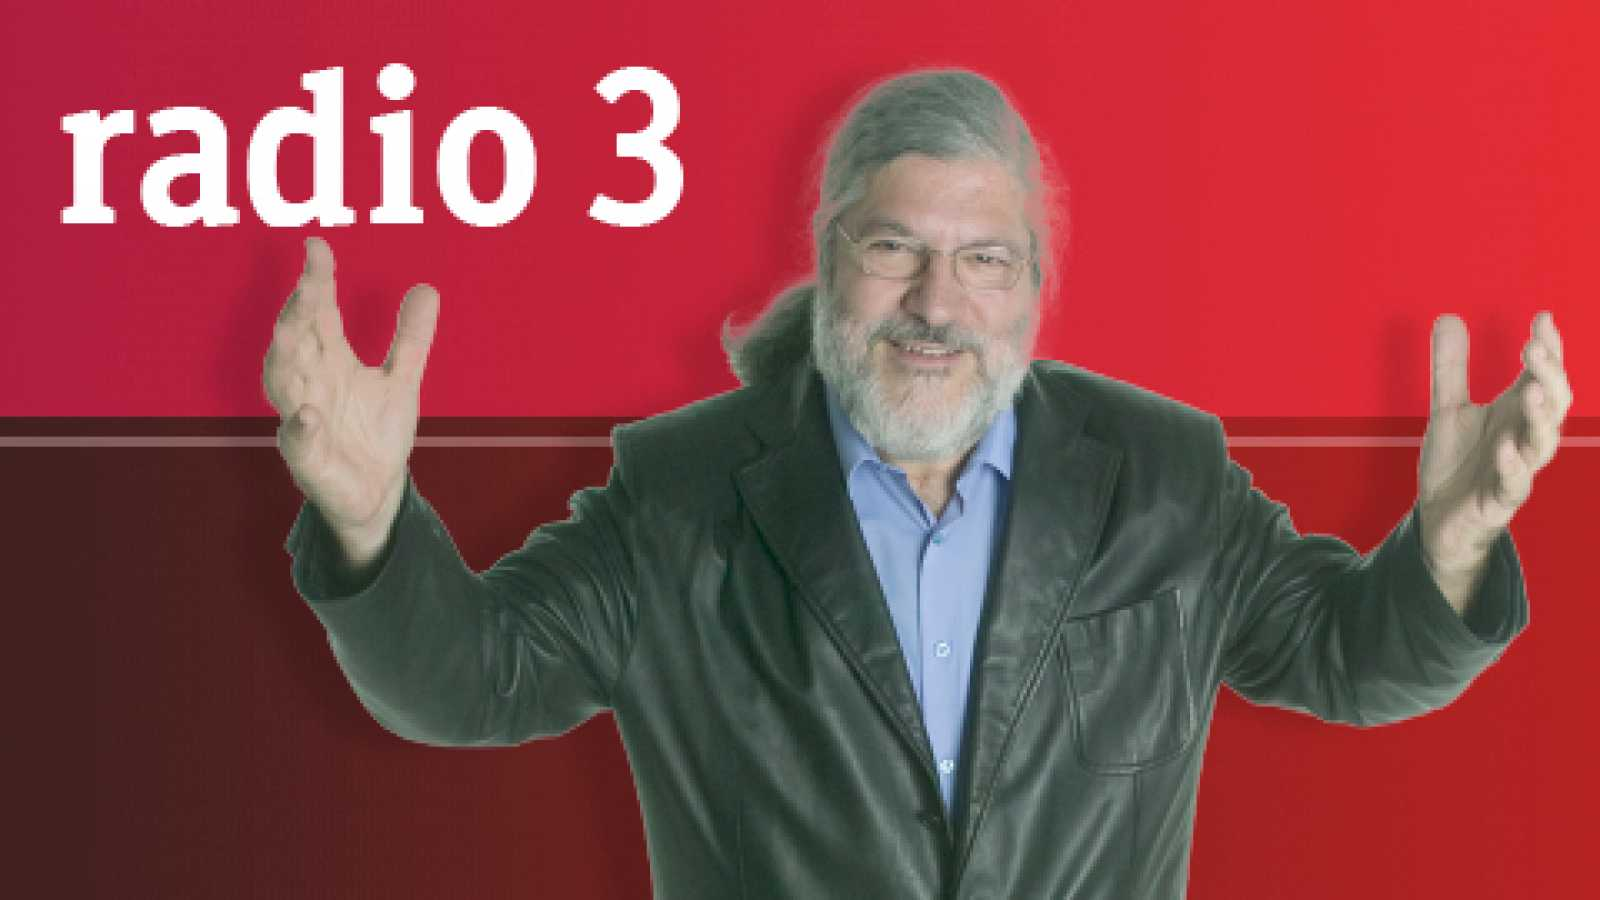 Discópolis Jazz - 11.241: Jazz I am 2 Magali Datzira, T. Merlo, M. Azpiroz - 27/02/21 - escuchar ahora